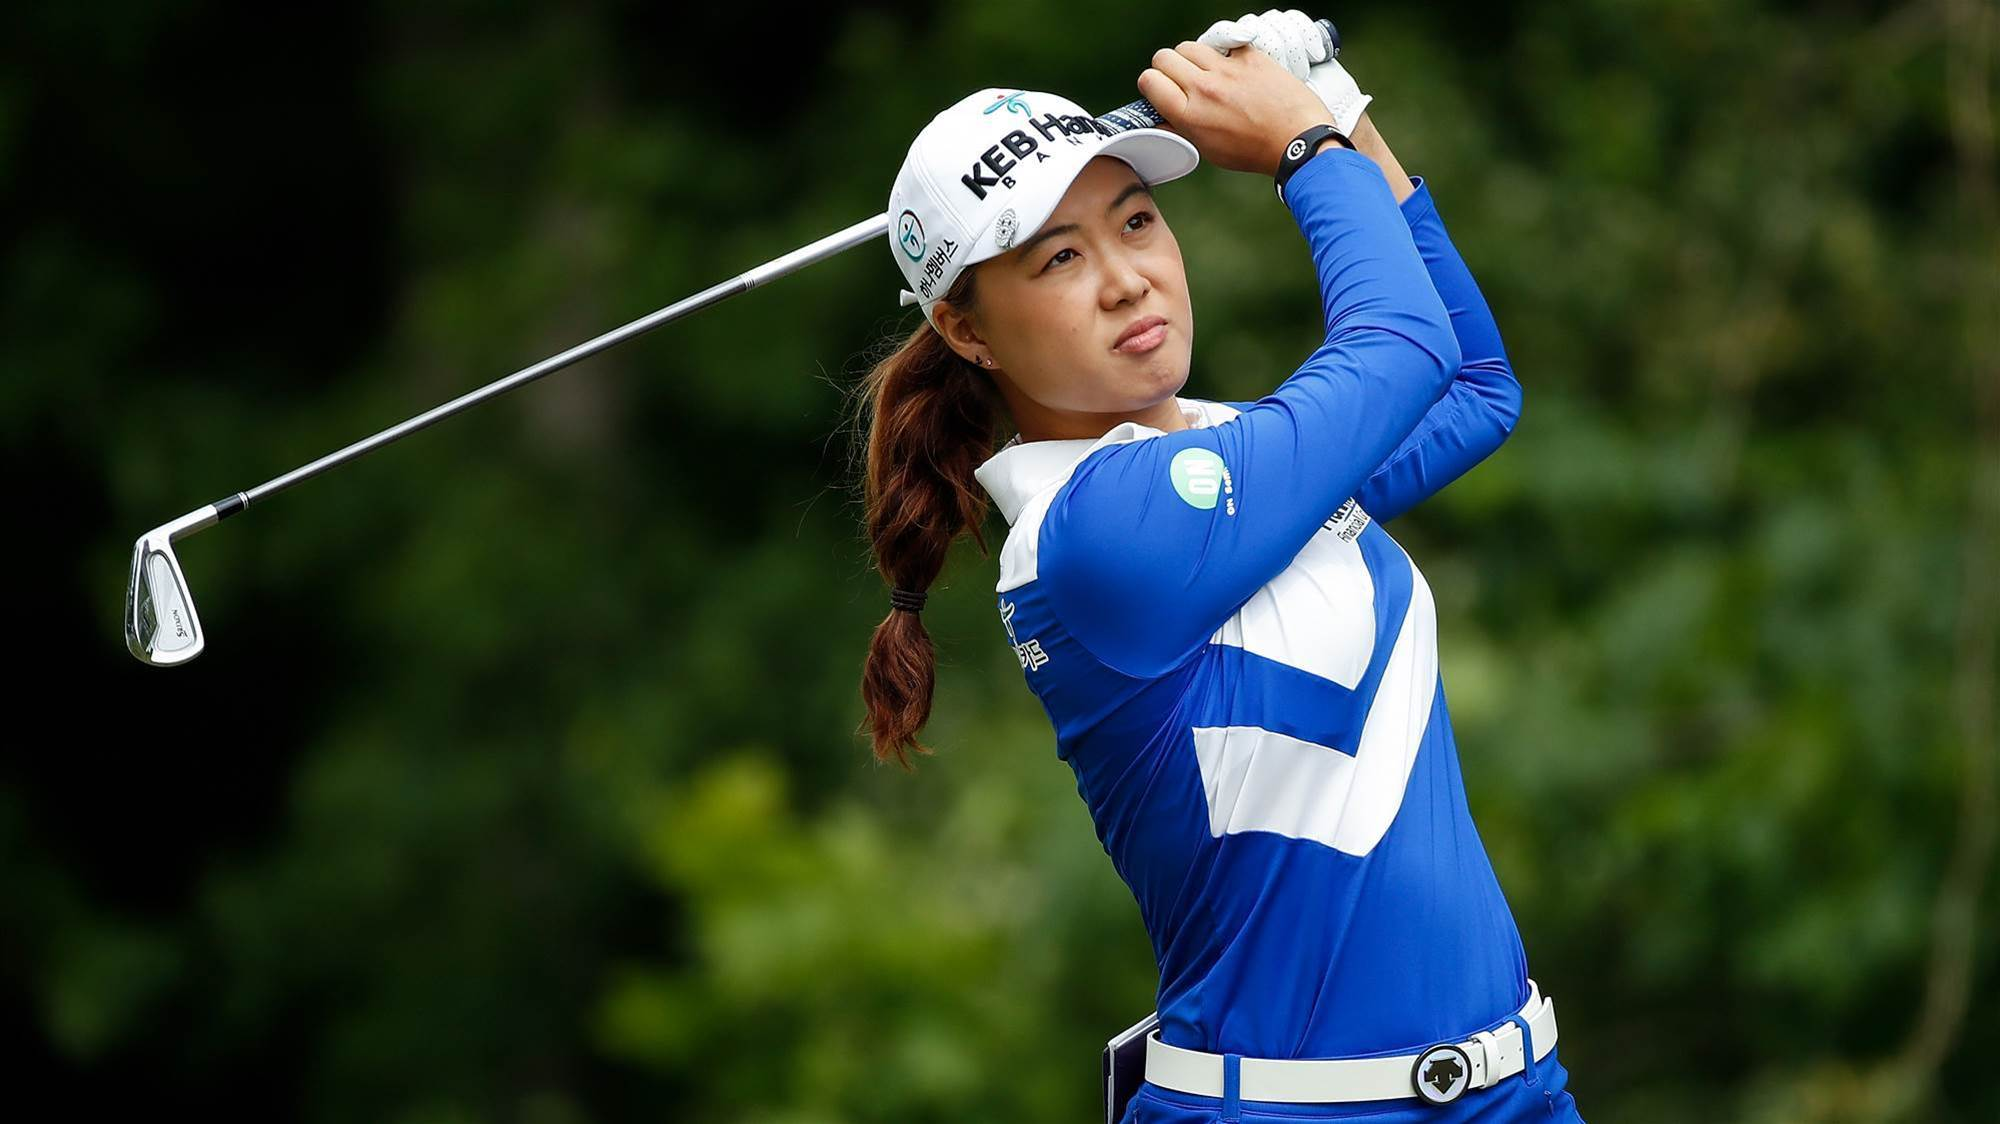 LPGA: Minjee Lee signs for runner-up finish